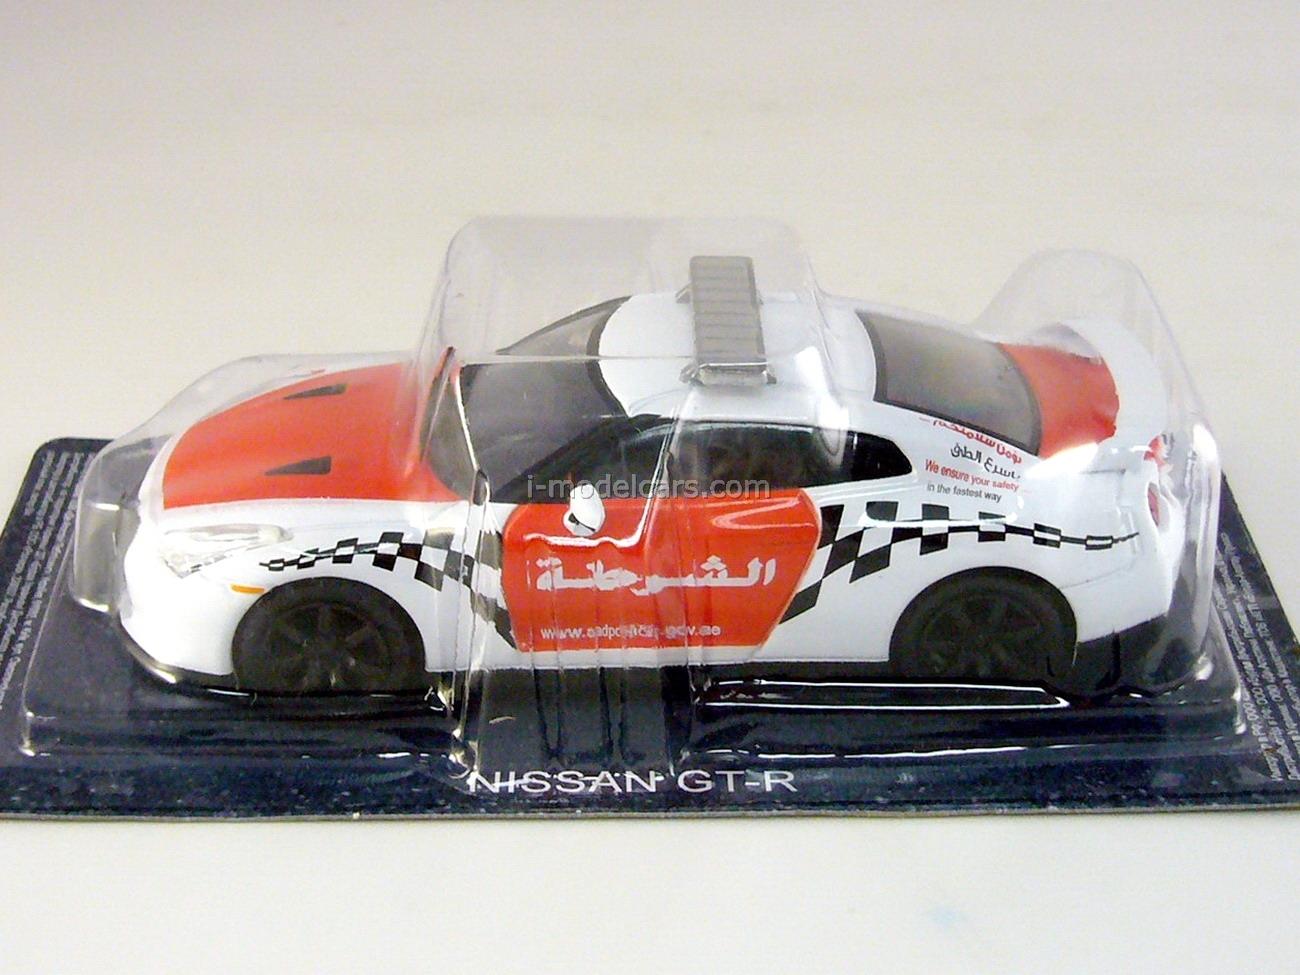 Nissan GTR Police Arab Emirates 1:43 DeAgostini World's Police Car #51